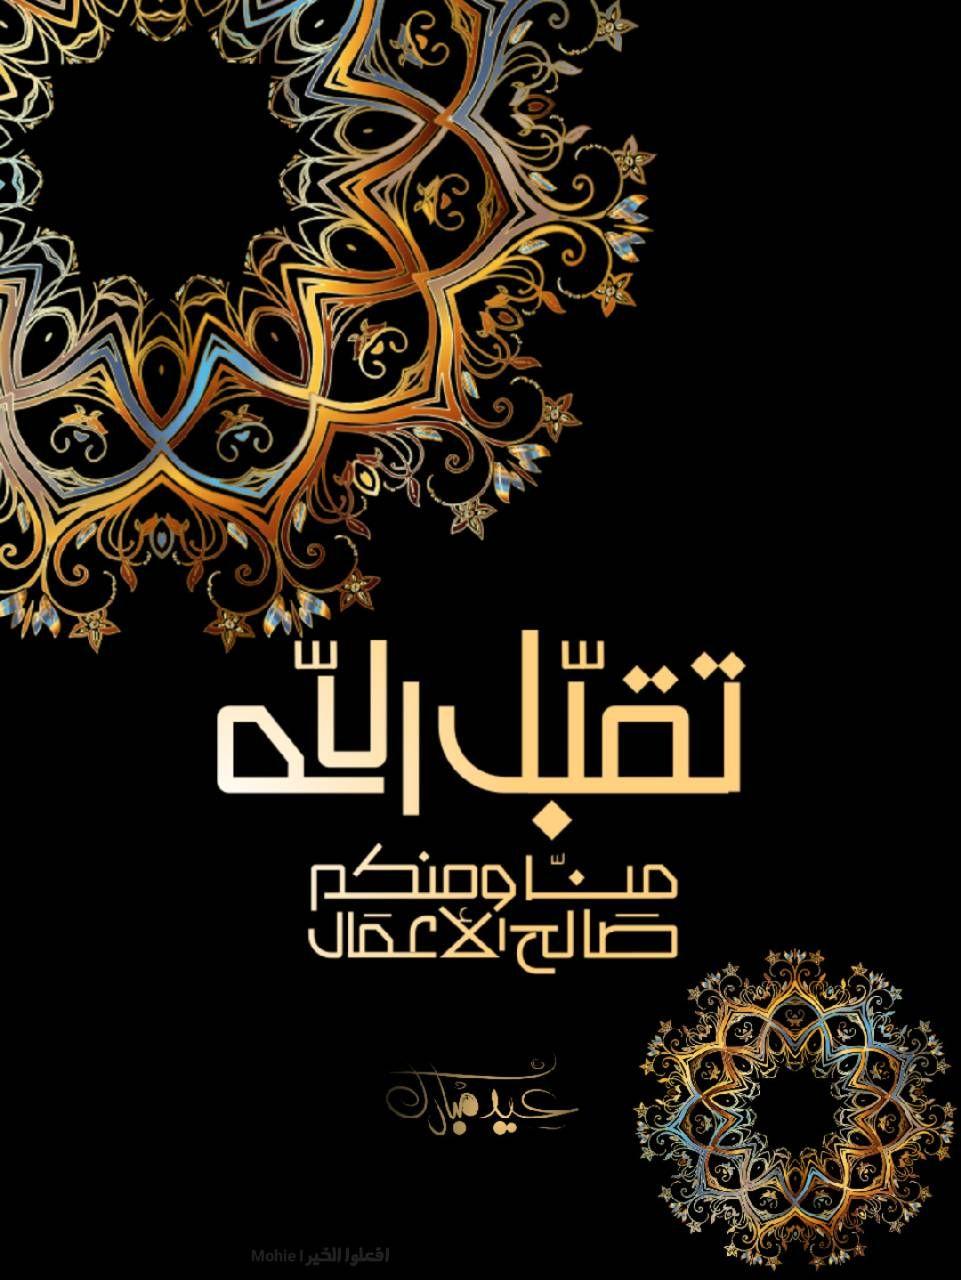 Download Eid Mubarak Wallpaper By Mohie214 C6 Free On Zedge Now Browse Millions Of Popular Arab Wallpapers A Eid Mubarak Wallpaper Eid Mubarak Eid Photos